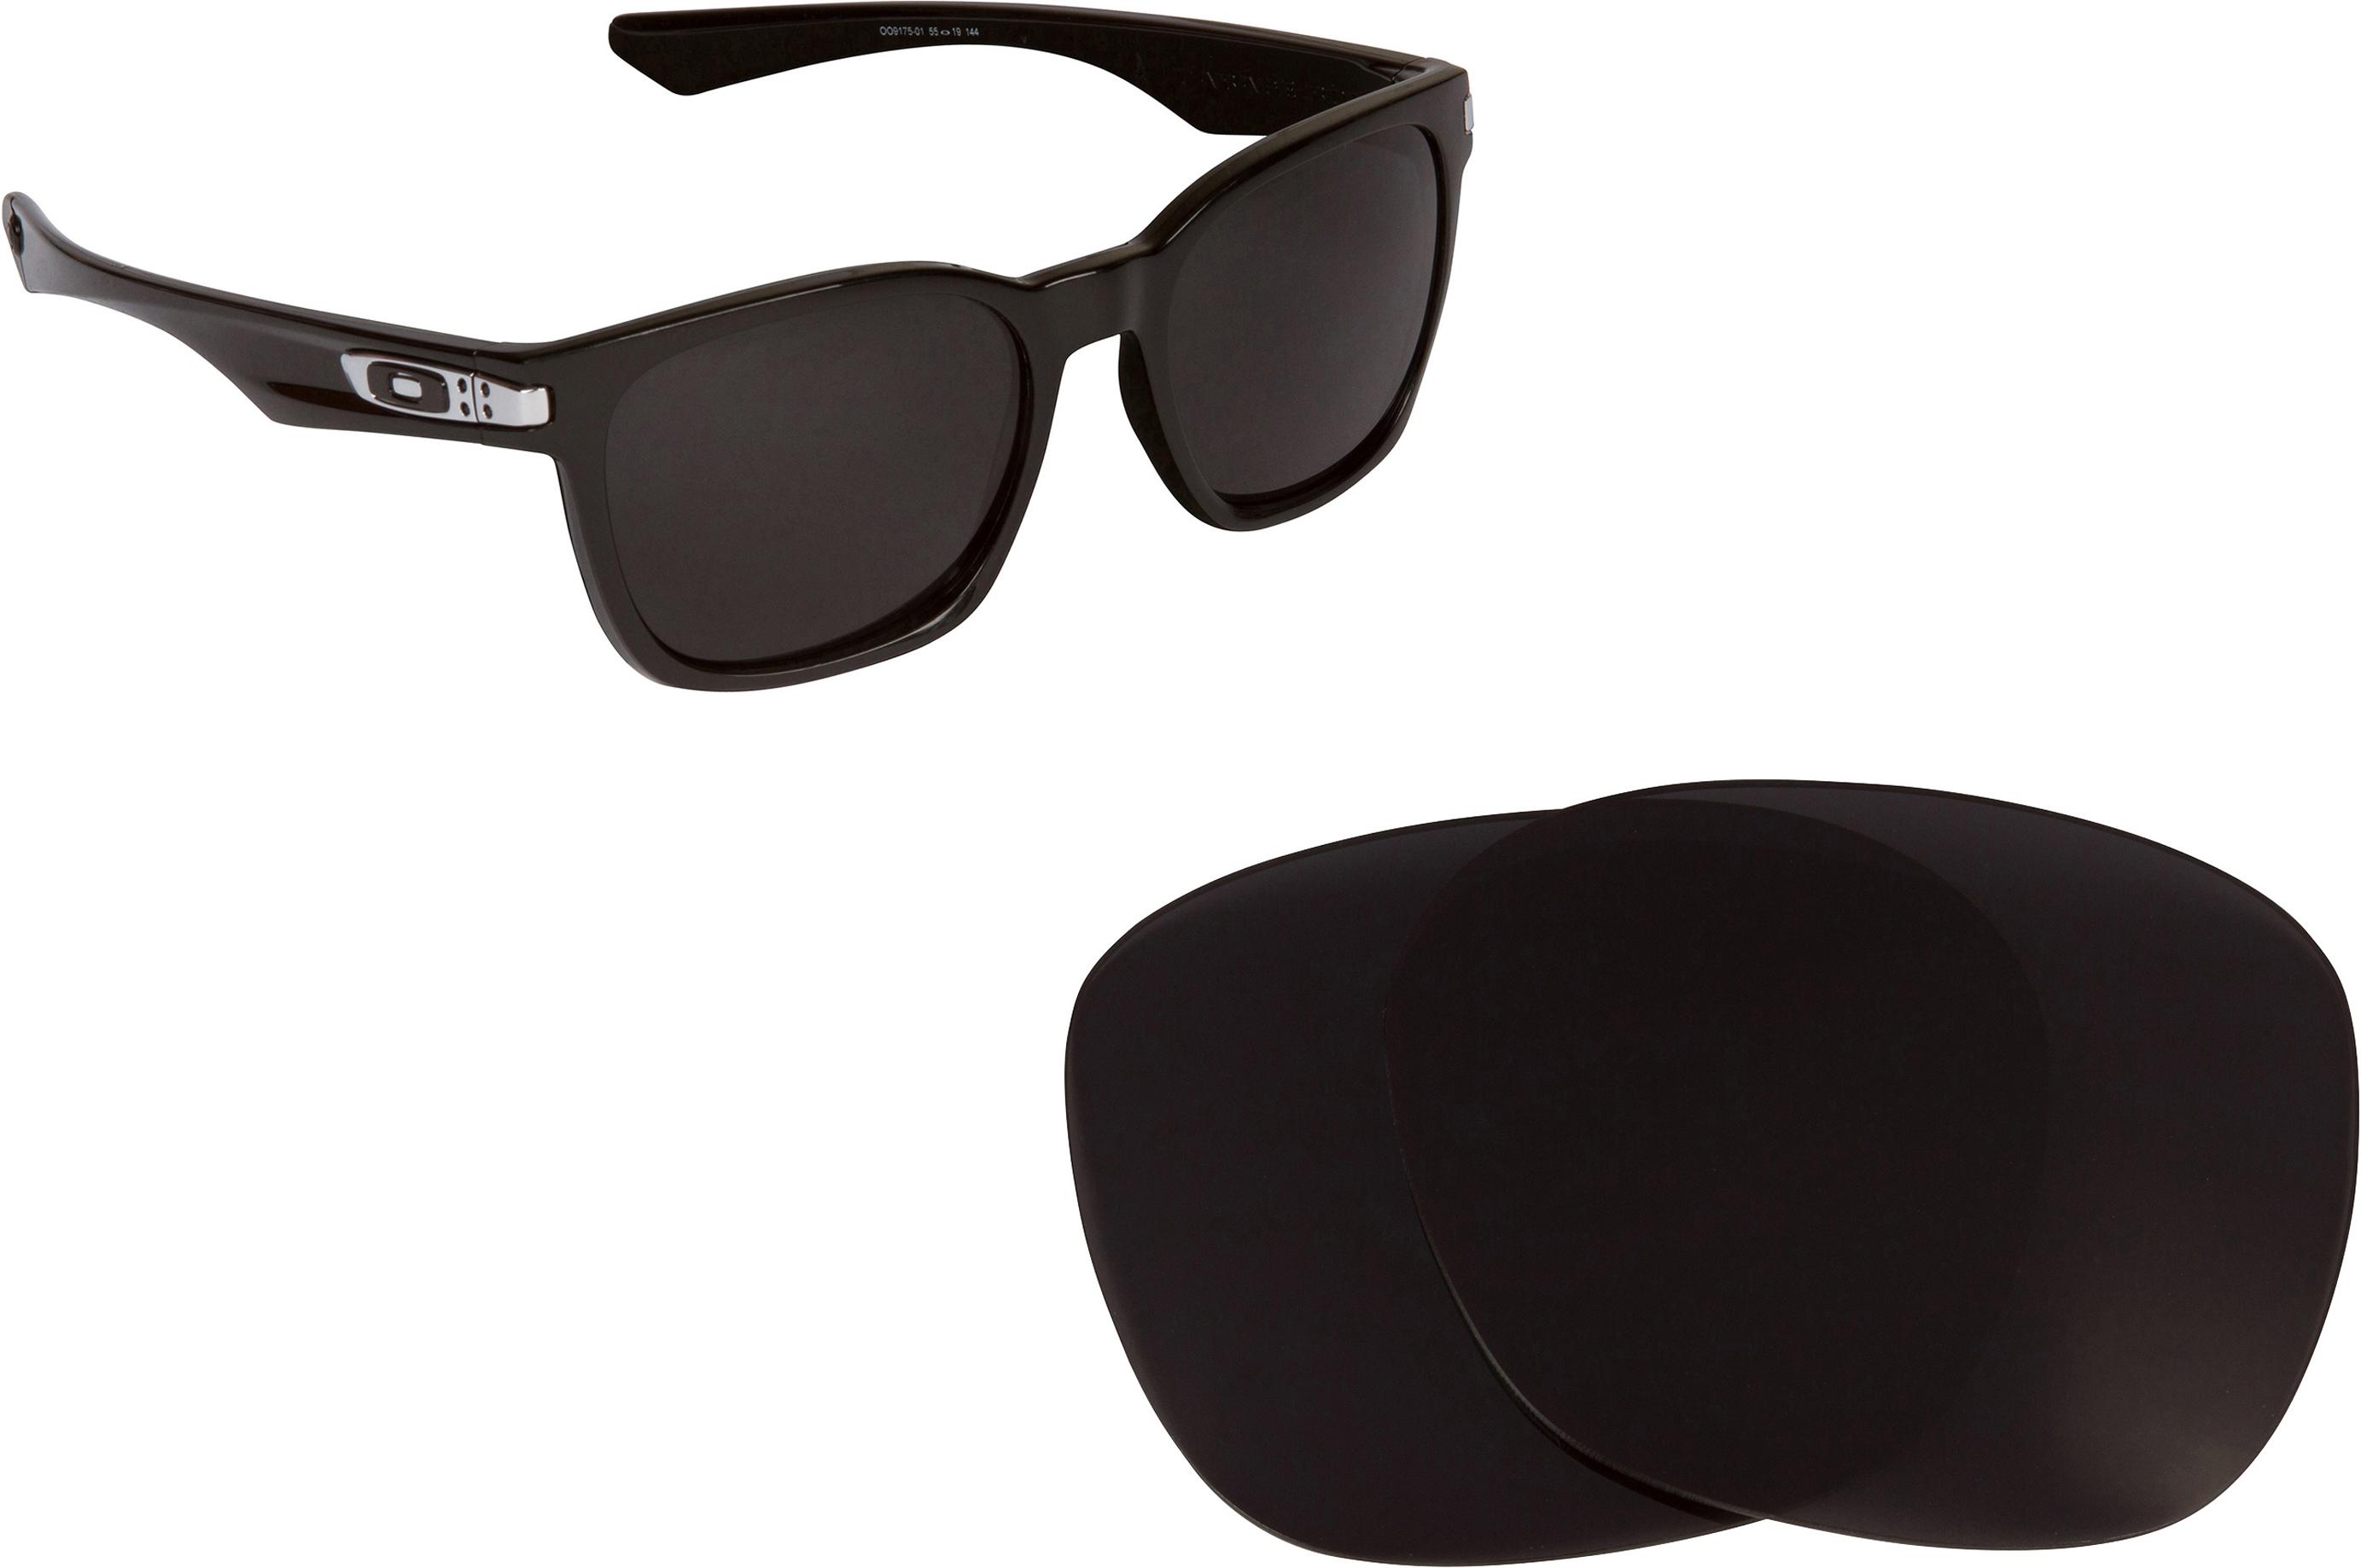 dc32c17c78 Oakley Garage Rock Polarized Sunglasses « Heritage Malta